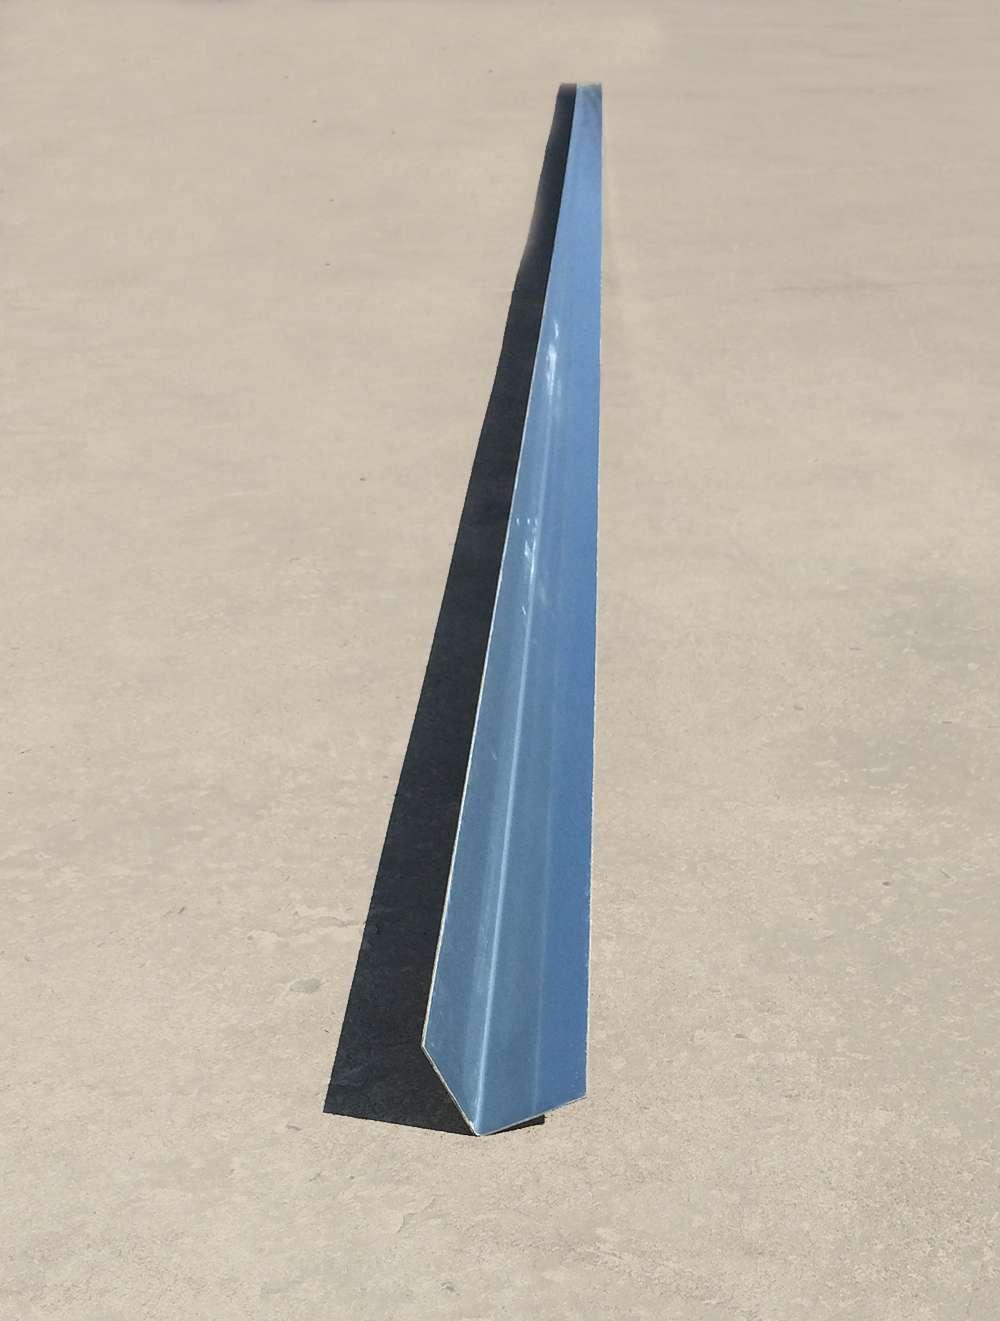 Cleater Grip Rail